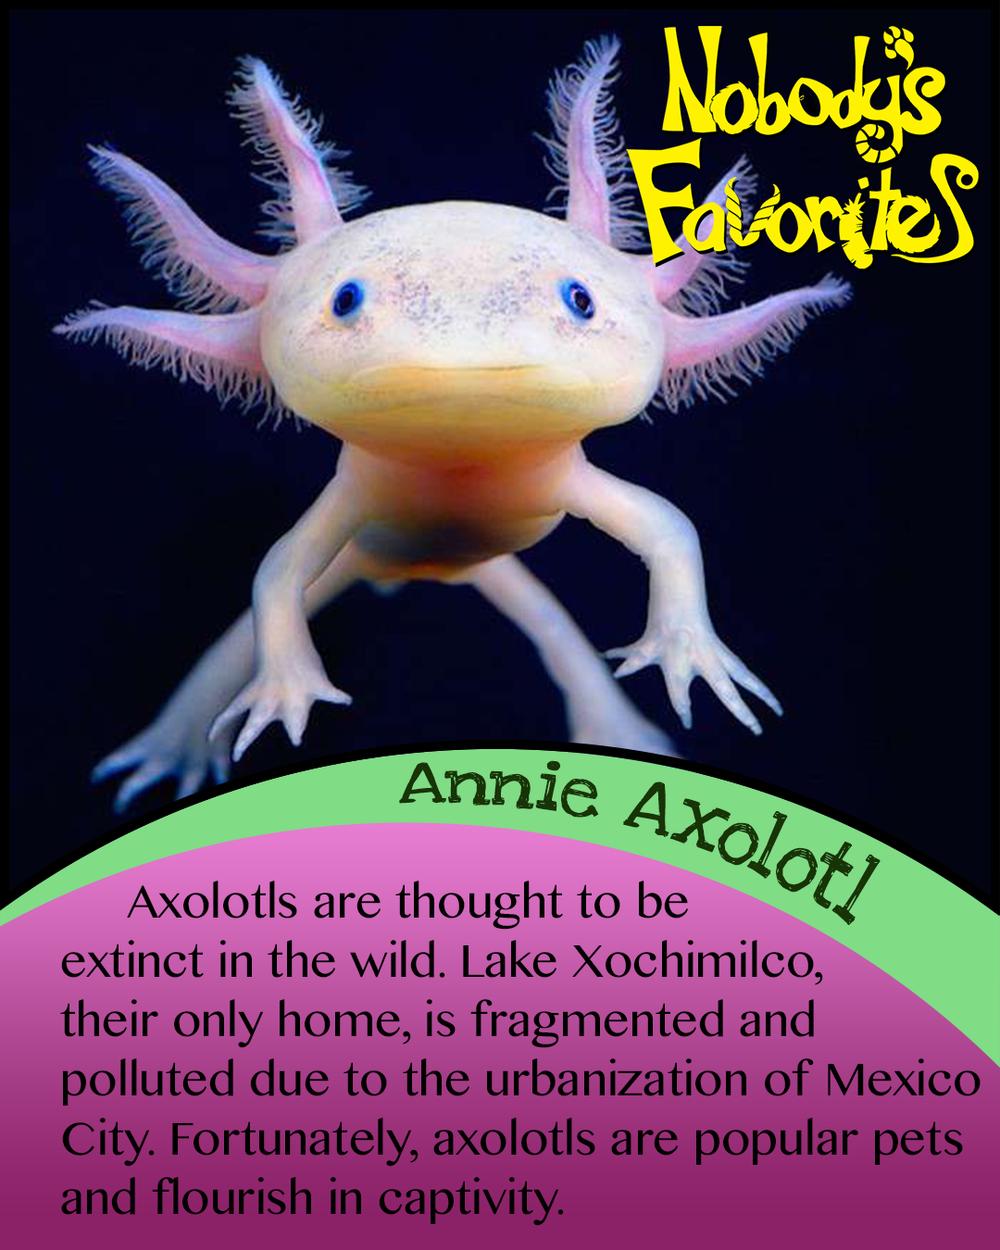 Annie Axolotl - Conservation